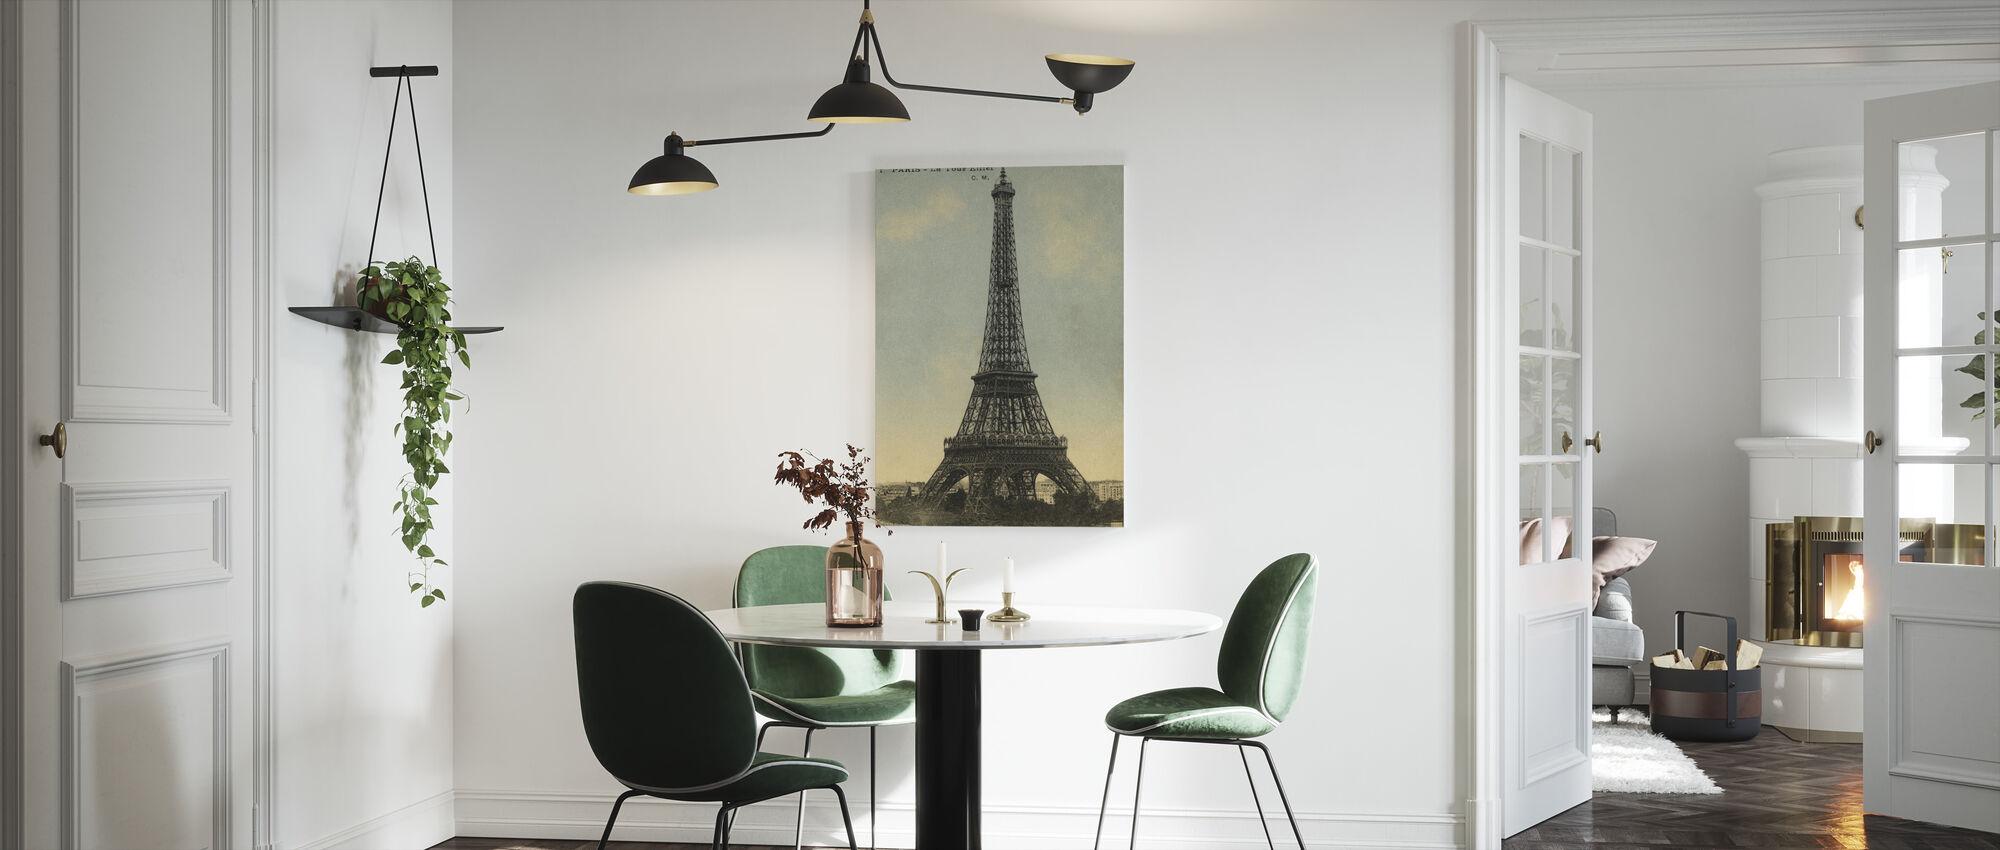 Vintage Eiffeltoren Blauwe Lucht - Canvas print - Keuken